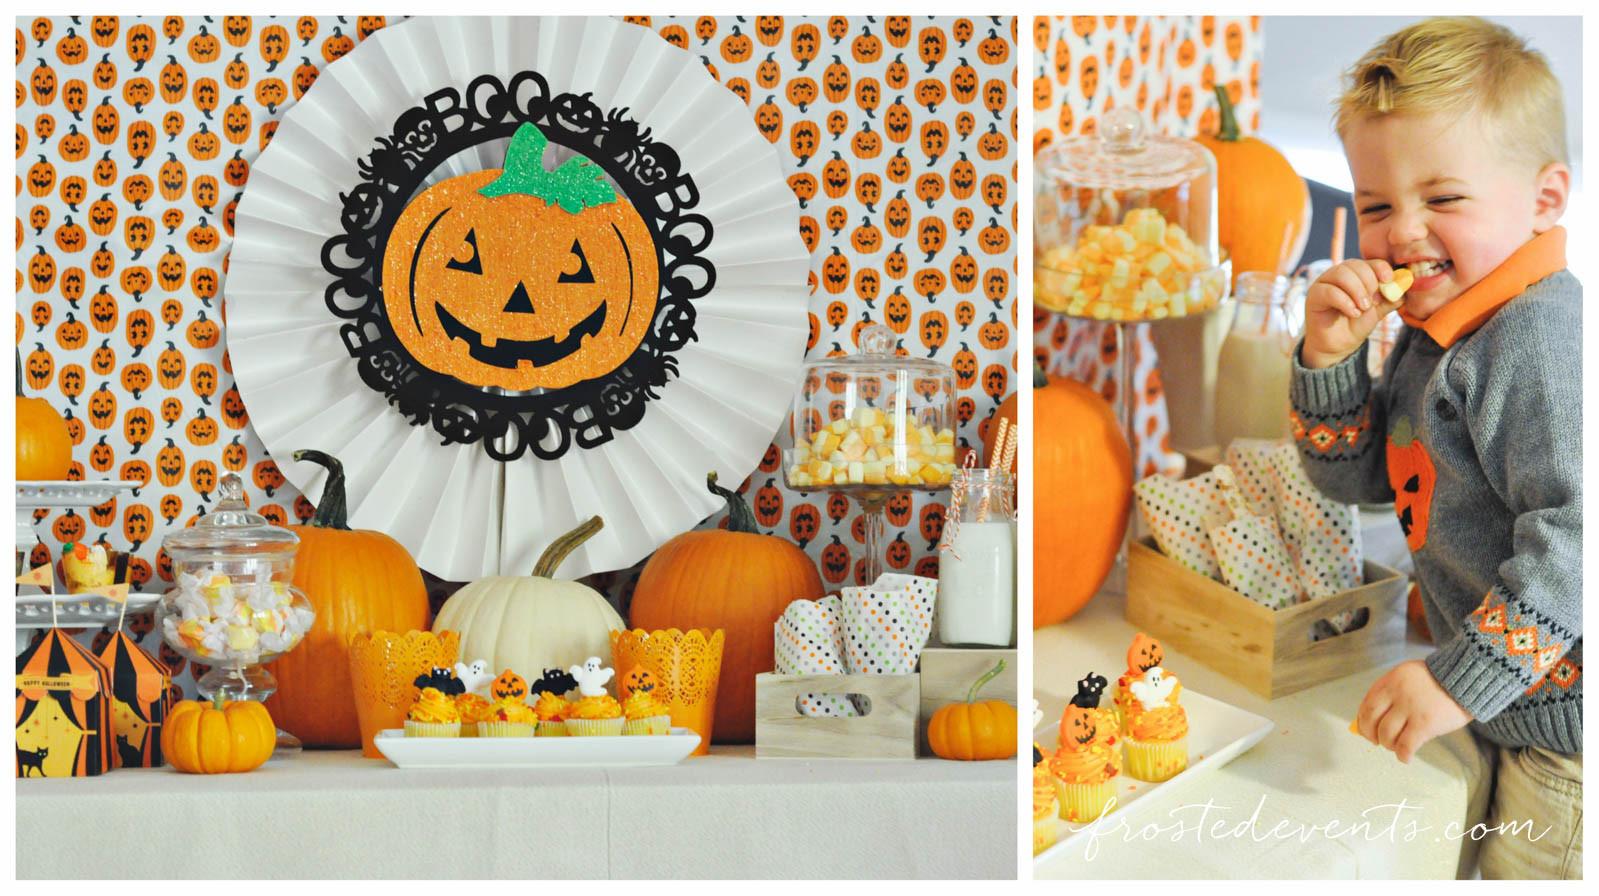 Kids Halloween Party Ideas  Halloween Ideas for Kids Cute Pumpkin Party